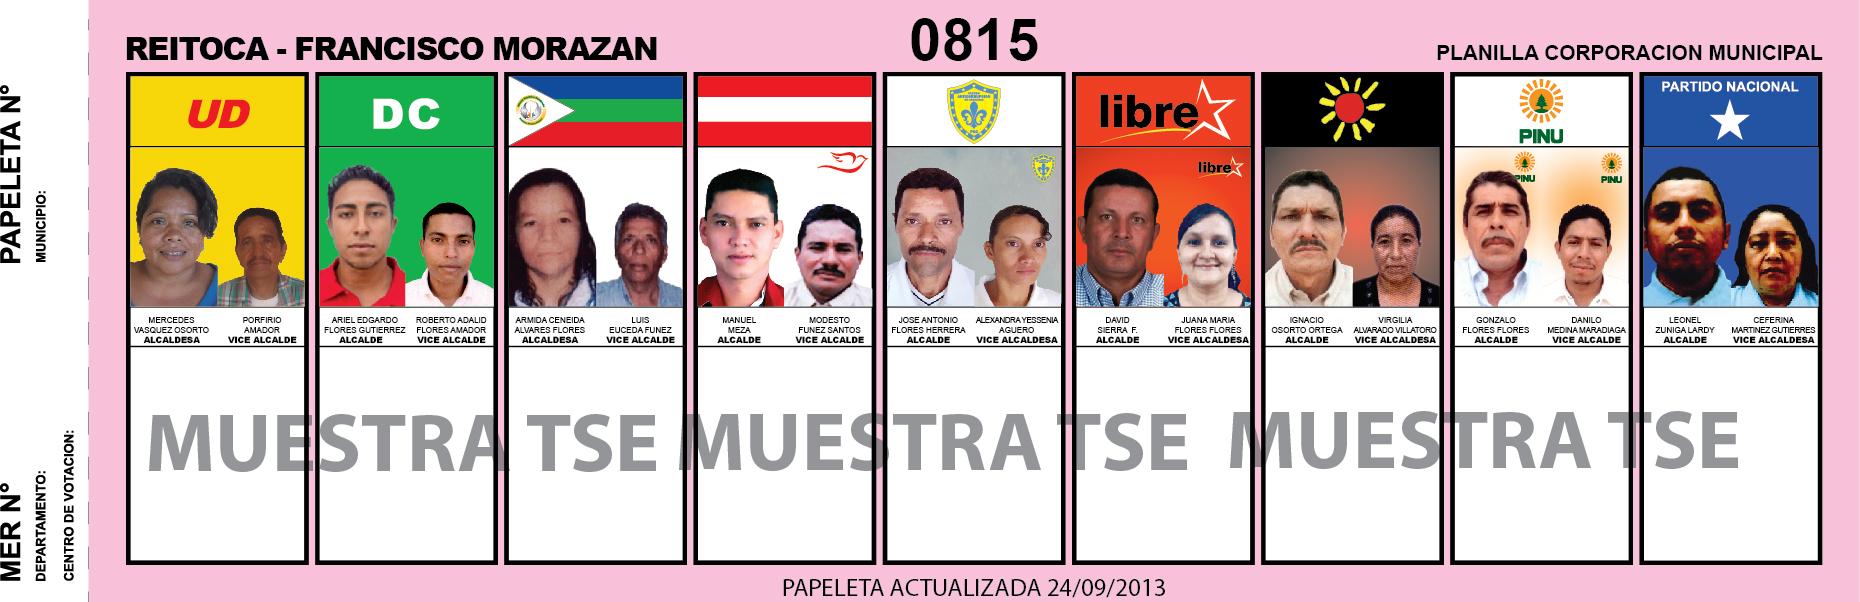 CANDIDATOS 2013 MUNICIPIO REITOCA - FRANCISCO MORAZAN - HONDURAS